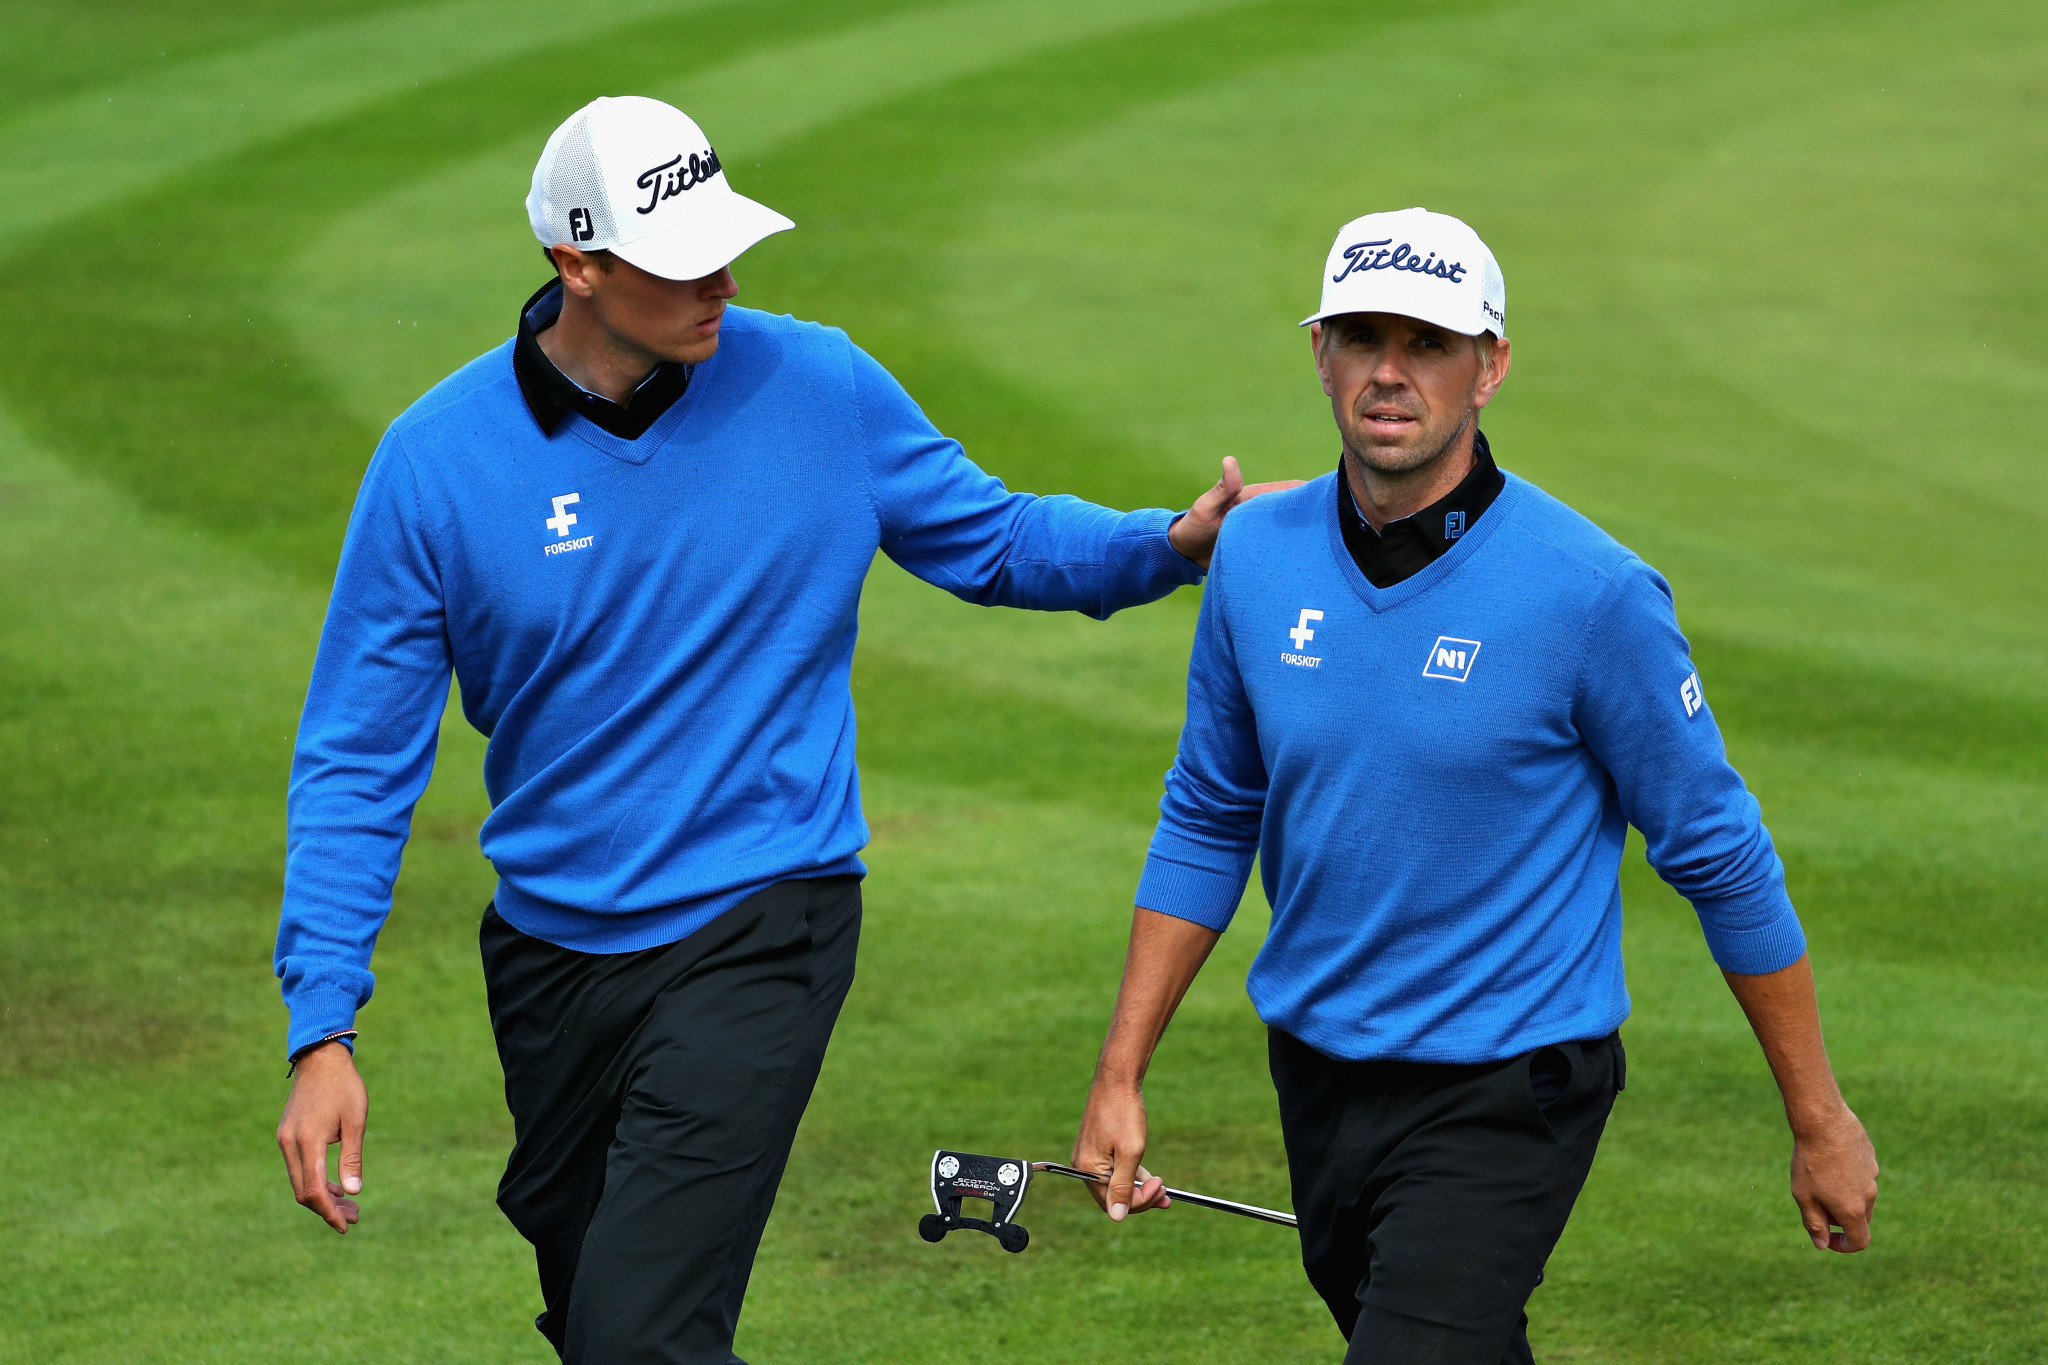 Icelandic duo book semi-final place at European Golf Team Championships